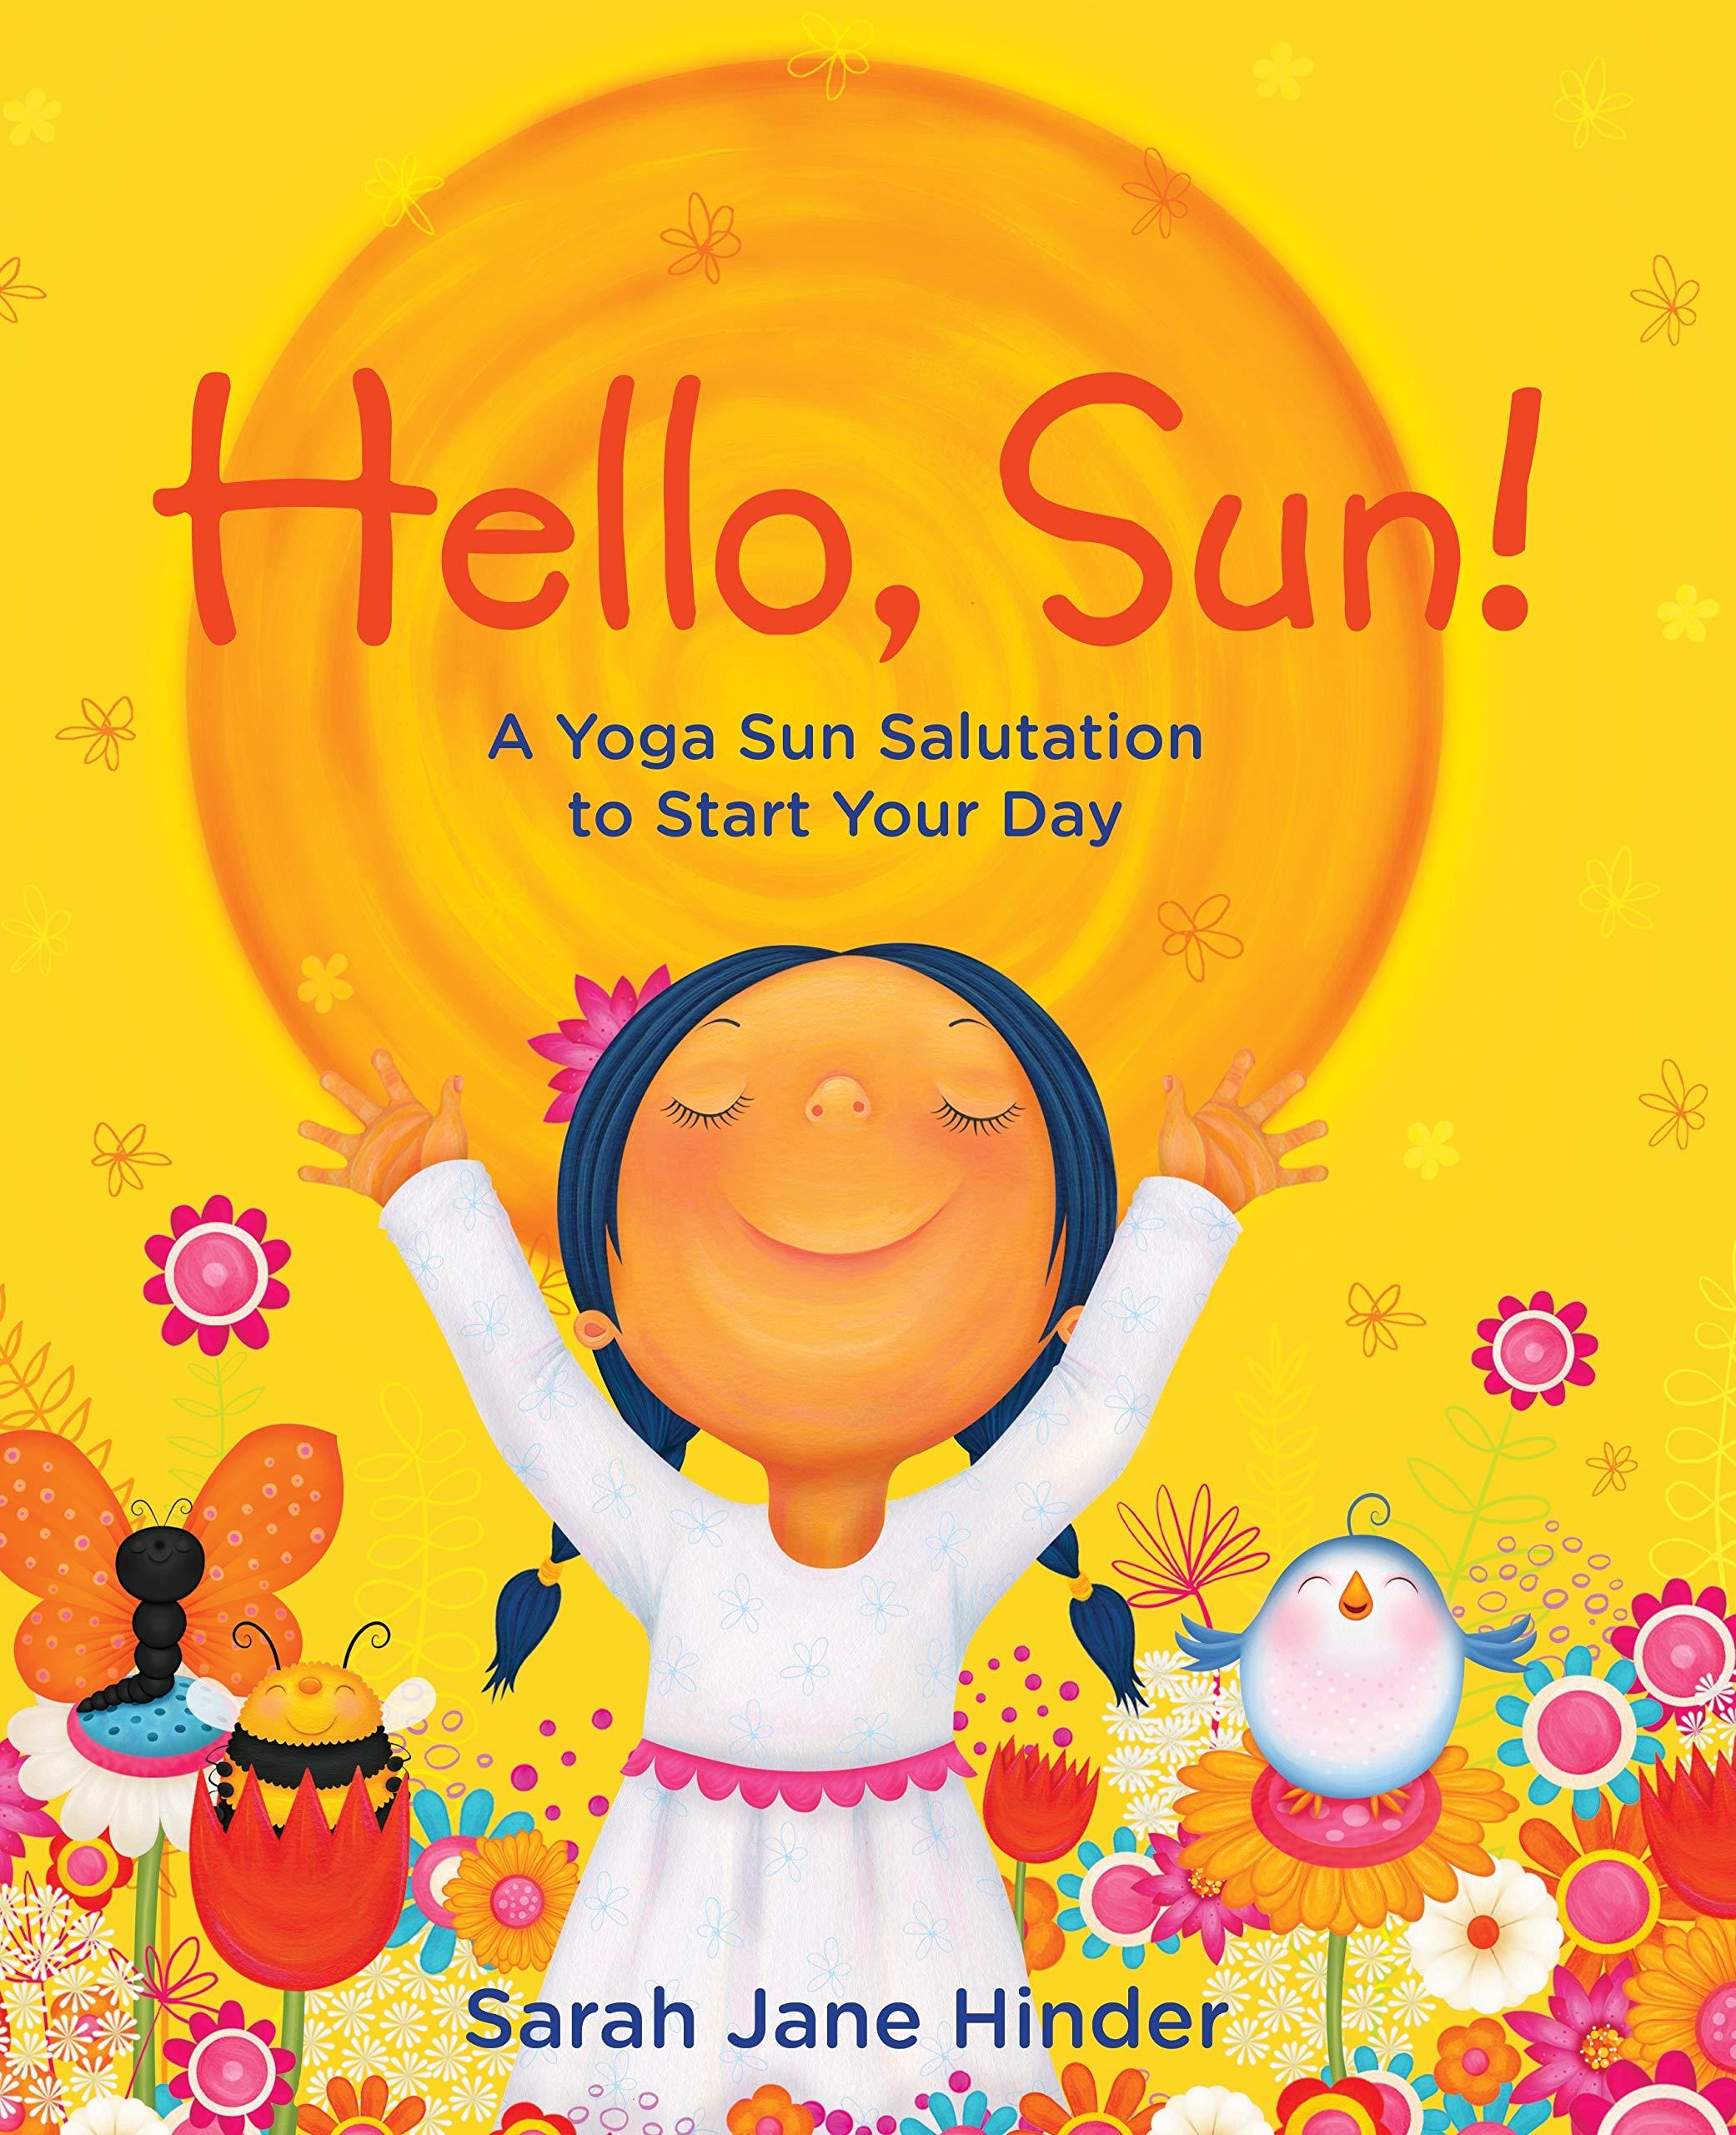 Hello, Sun!: A Yoga Sun Salutation to Start Your Day: Amazon ...